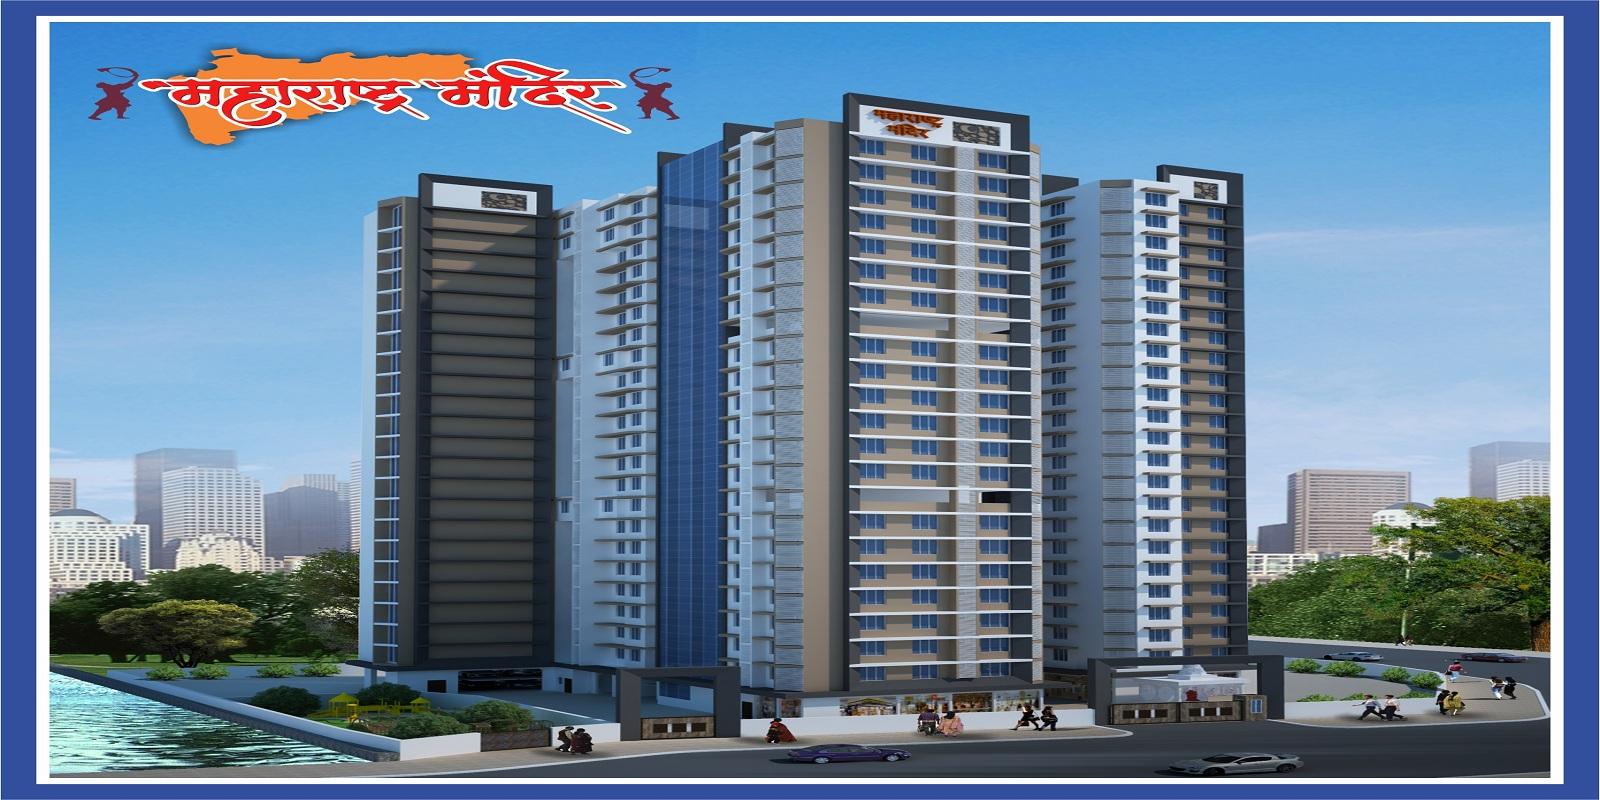 adhikari maharashtra mandir project project large image1